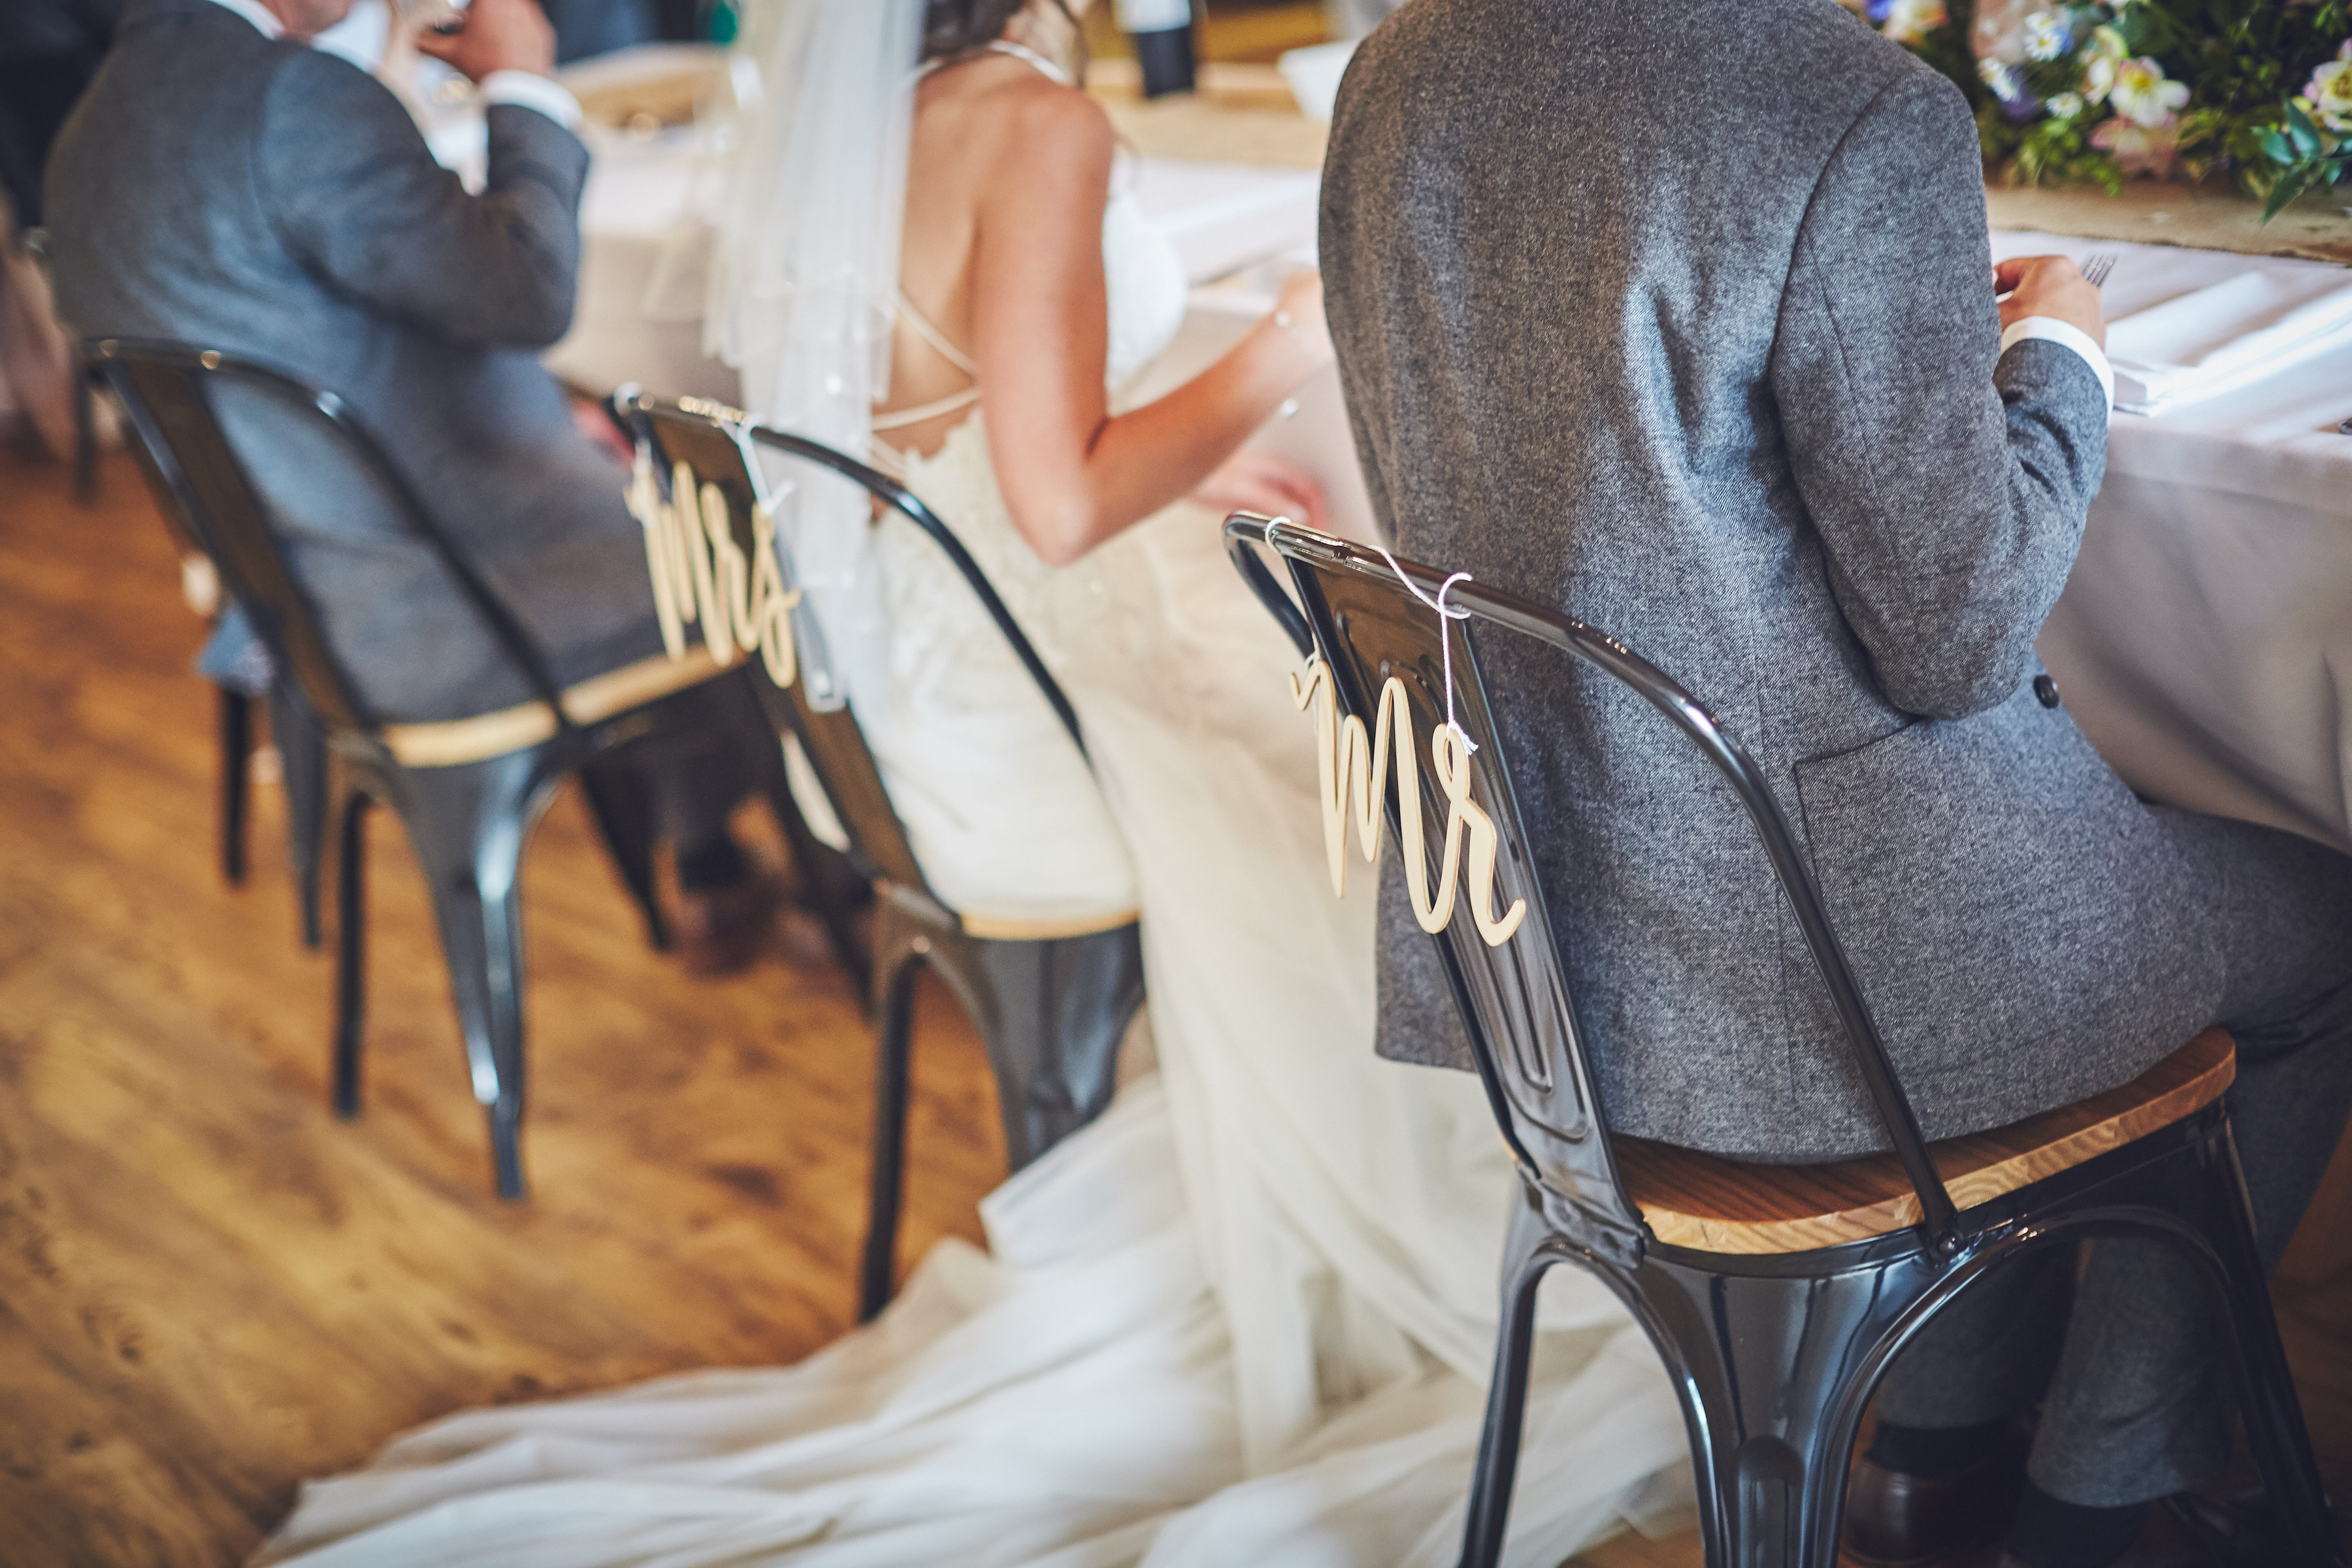 Mrs & Mrs named seats